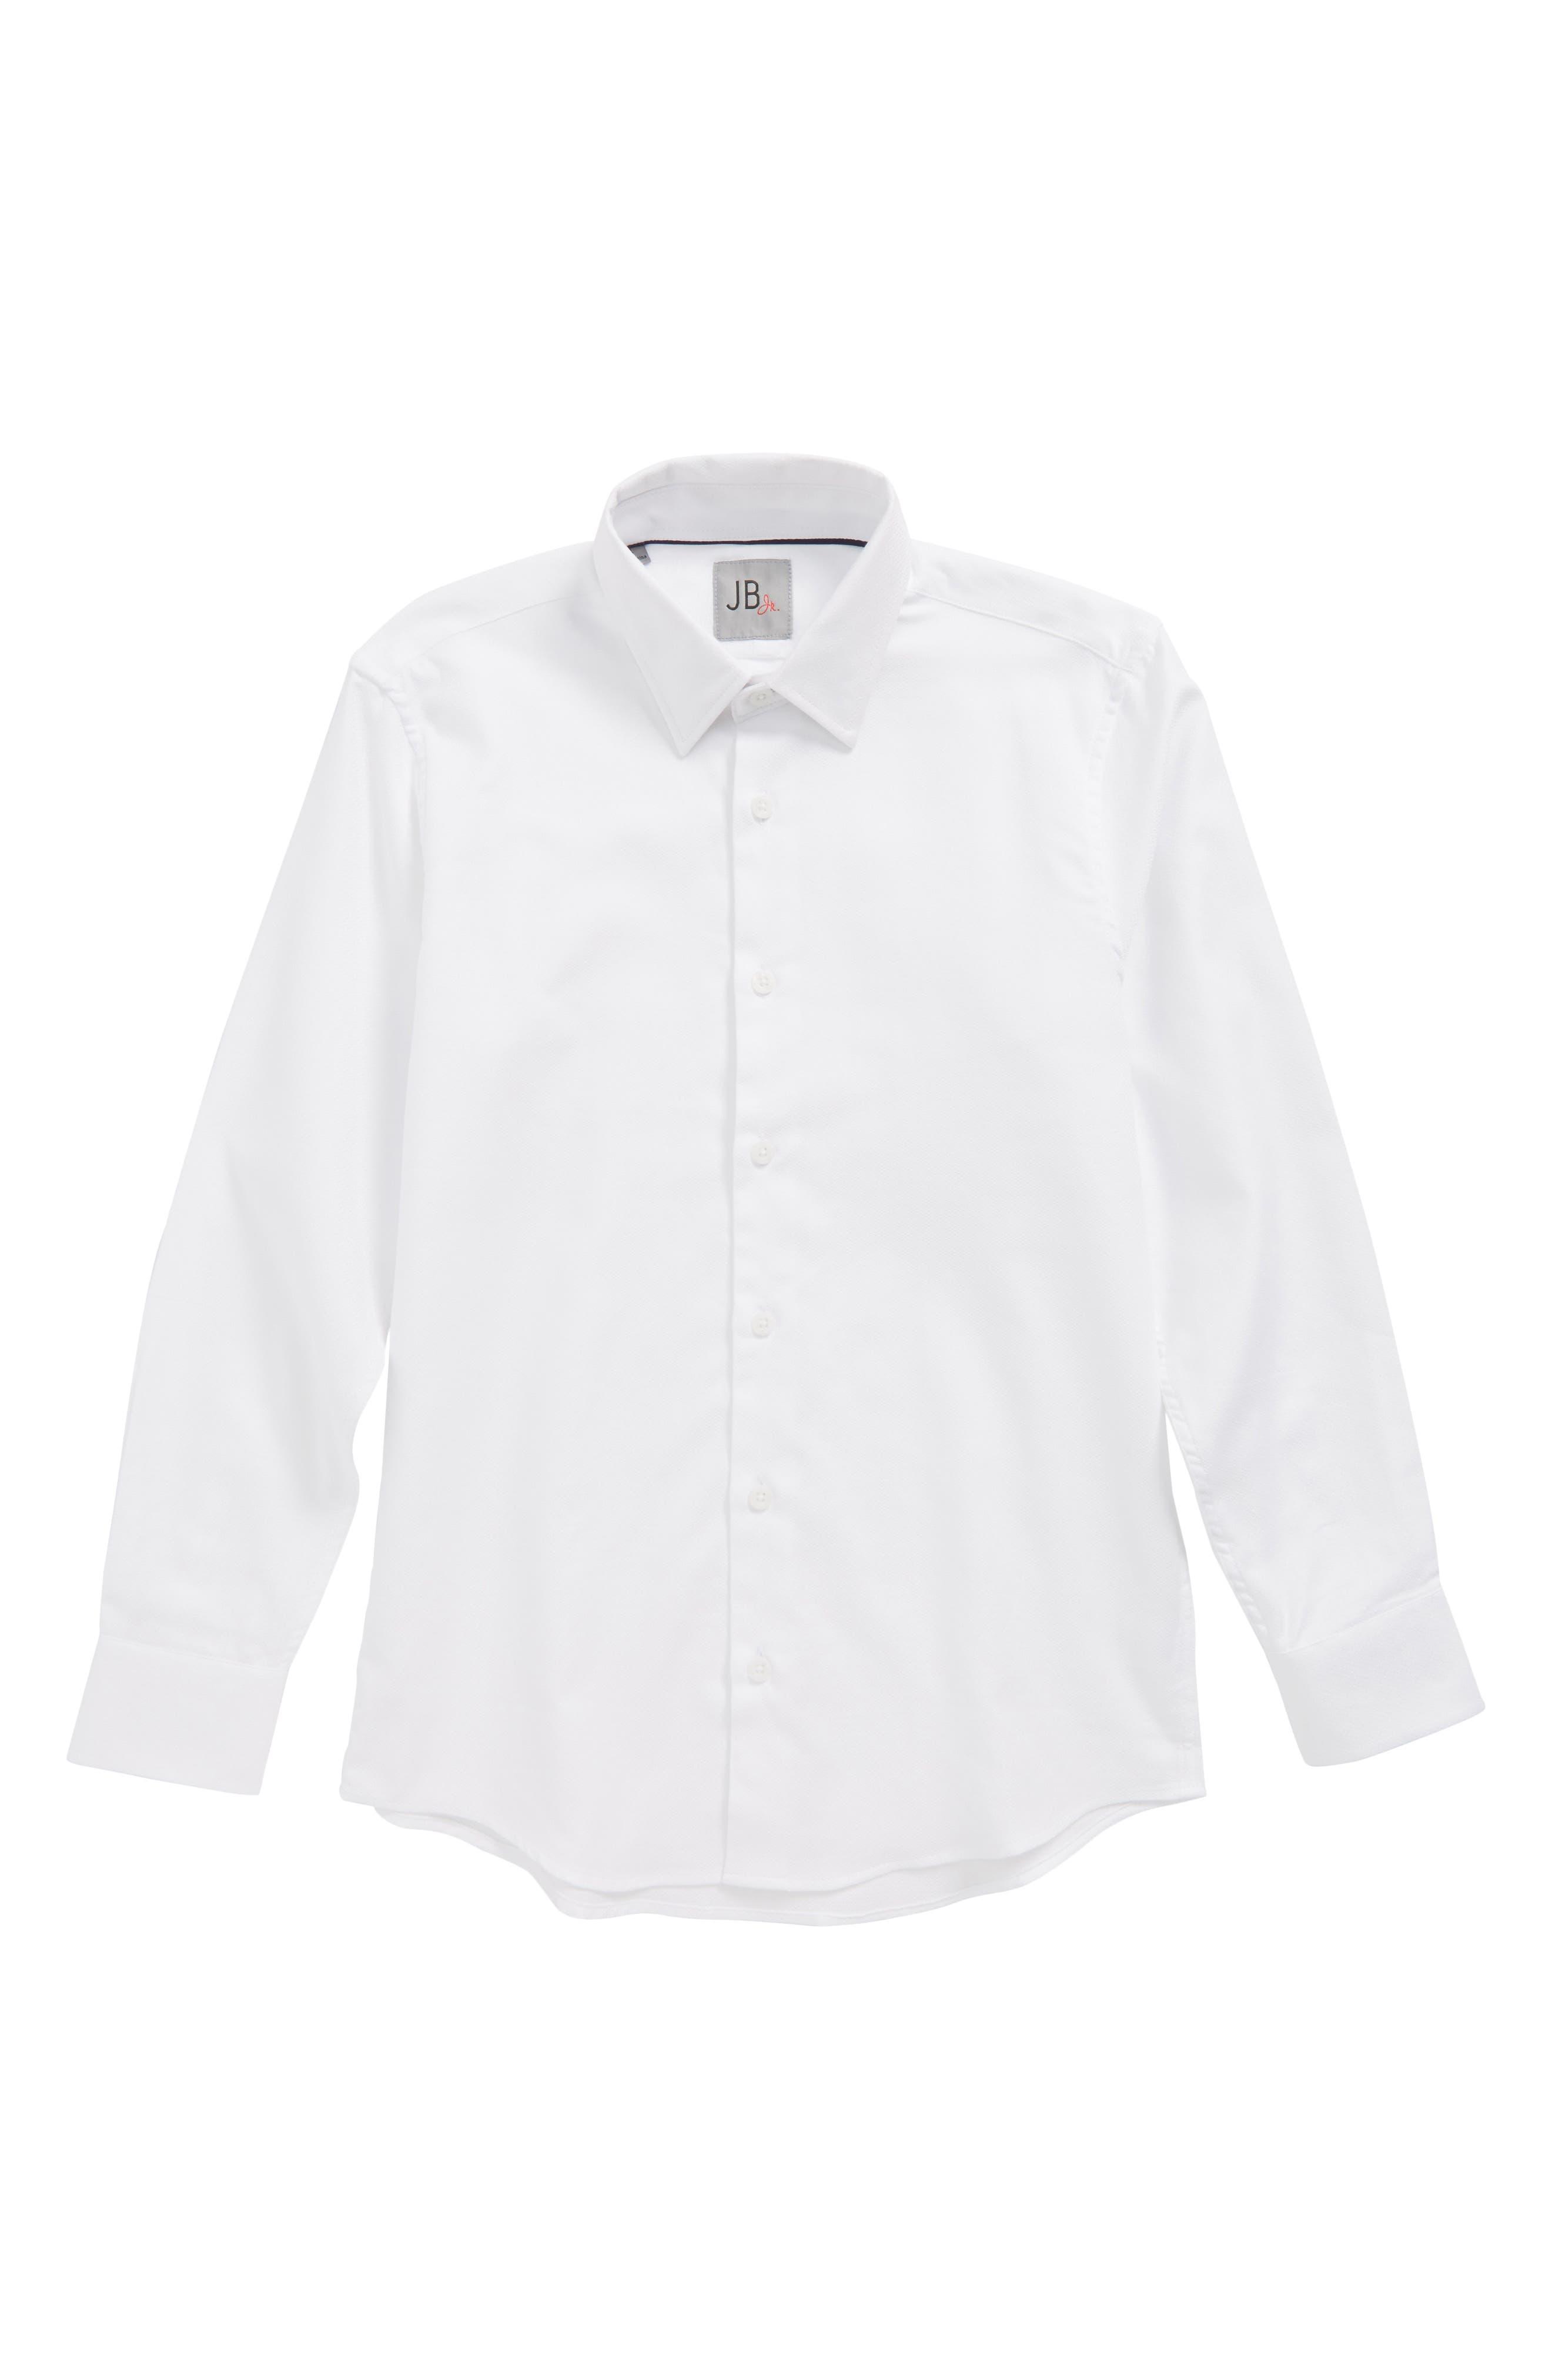 Textured Dress Shirt,                             Main thumbnail 1, color,                             White